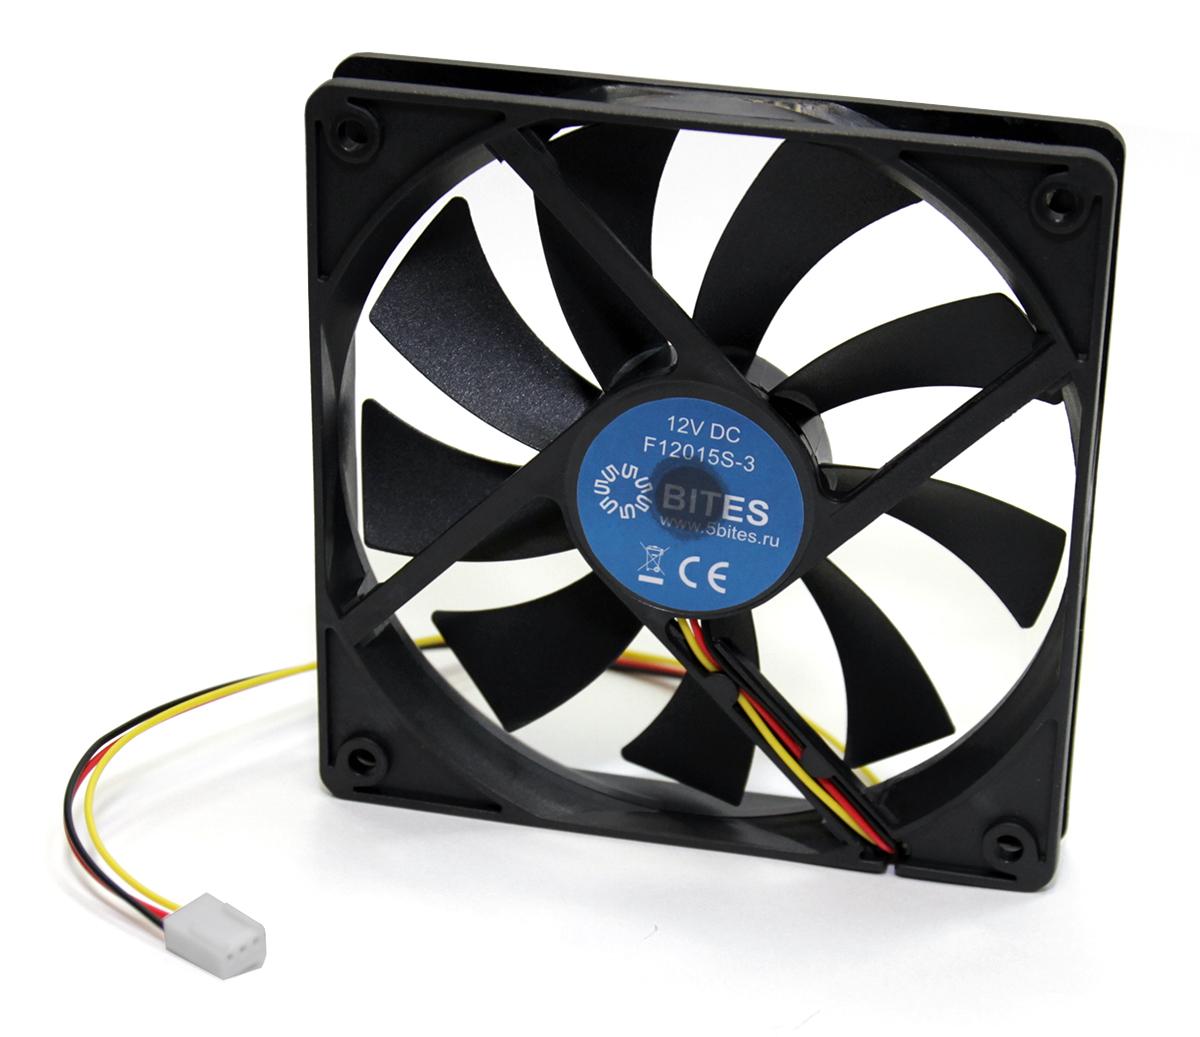 Вентилятор 5bites F12015S-3